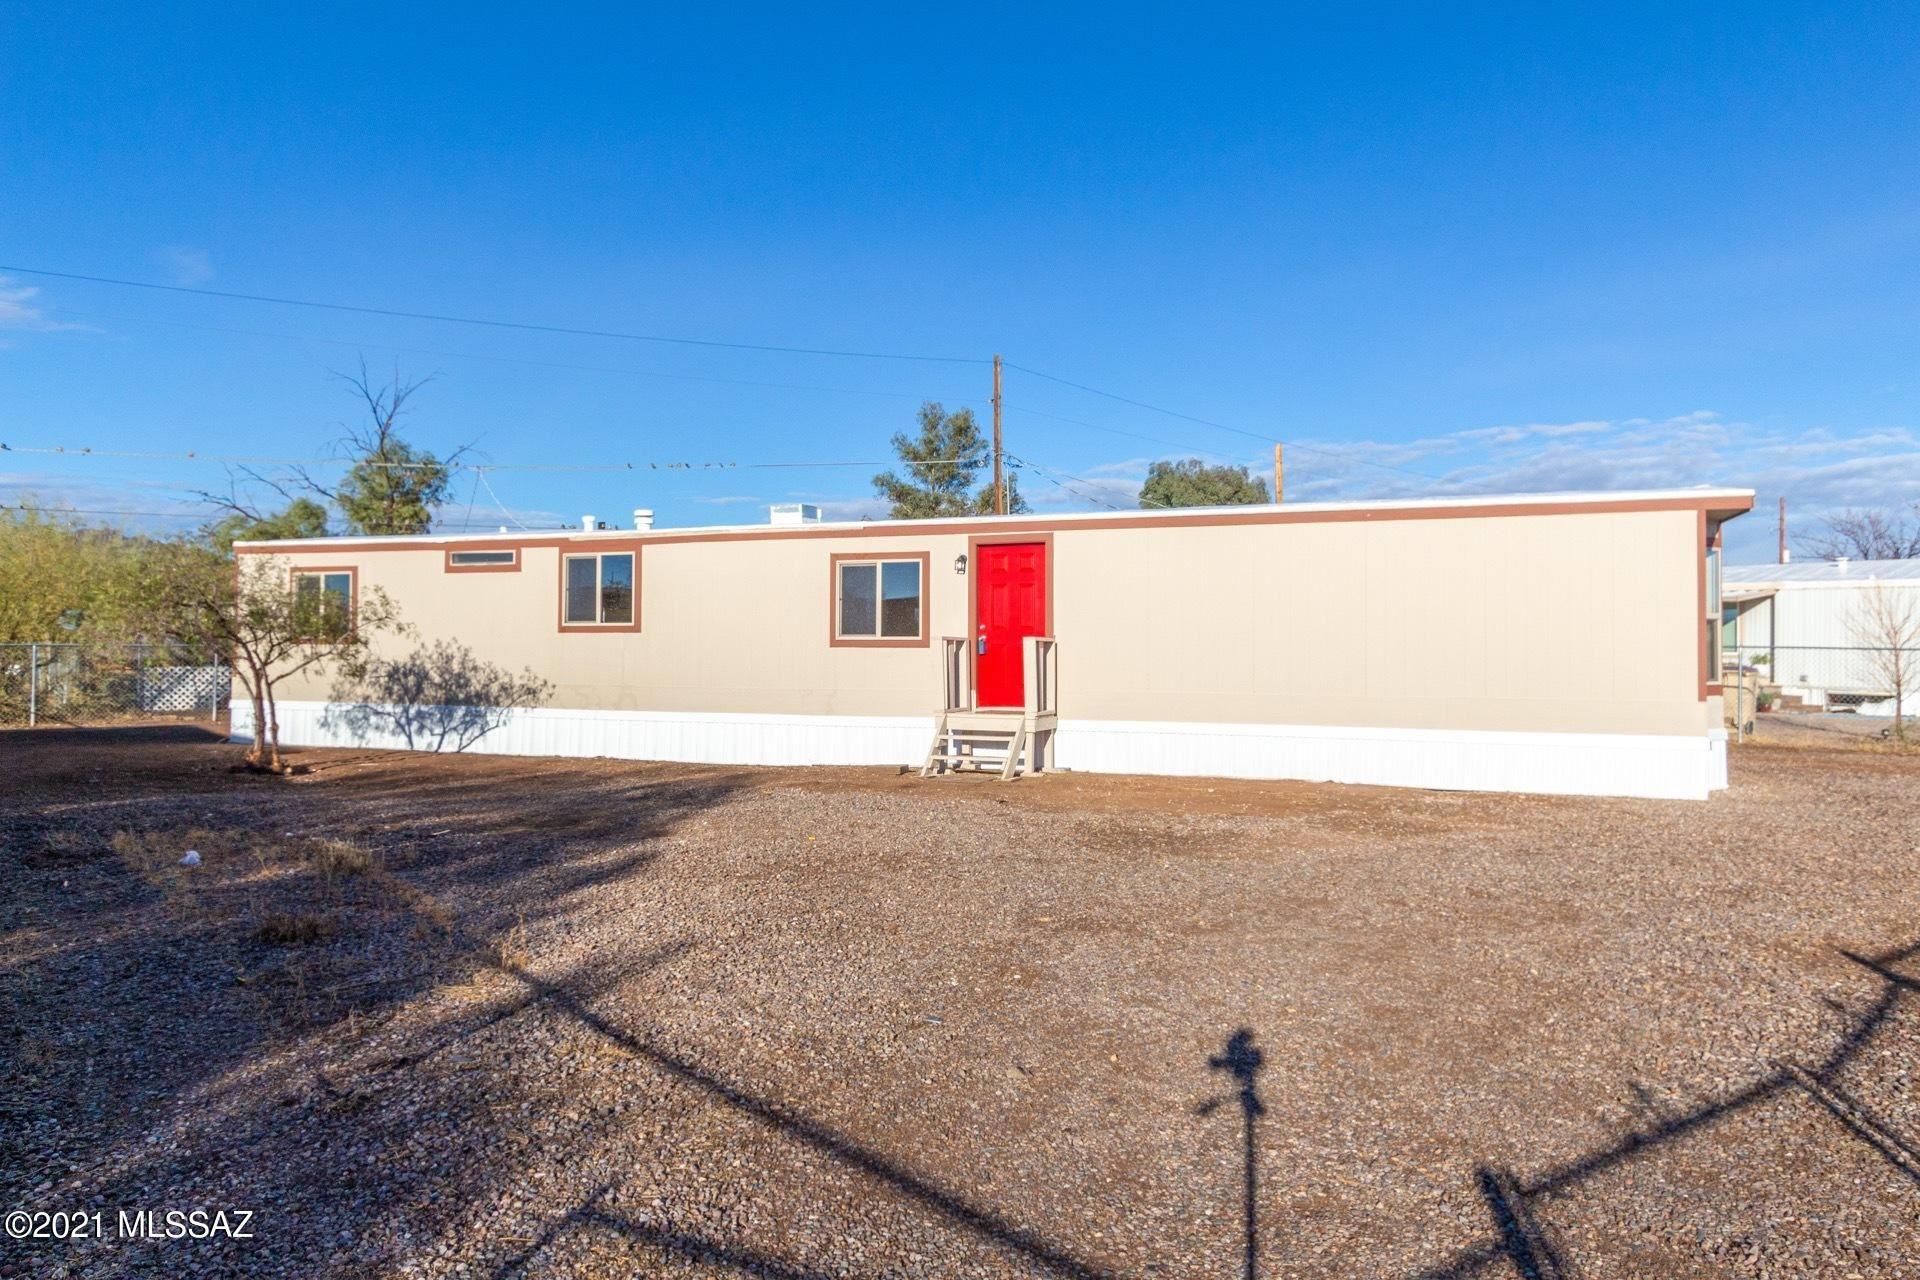 6902 W Walking M, Tucson, AZ 85757 - MLS#: 22101860